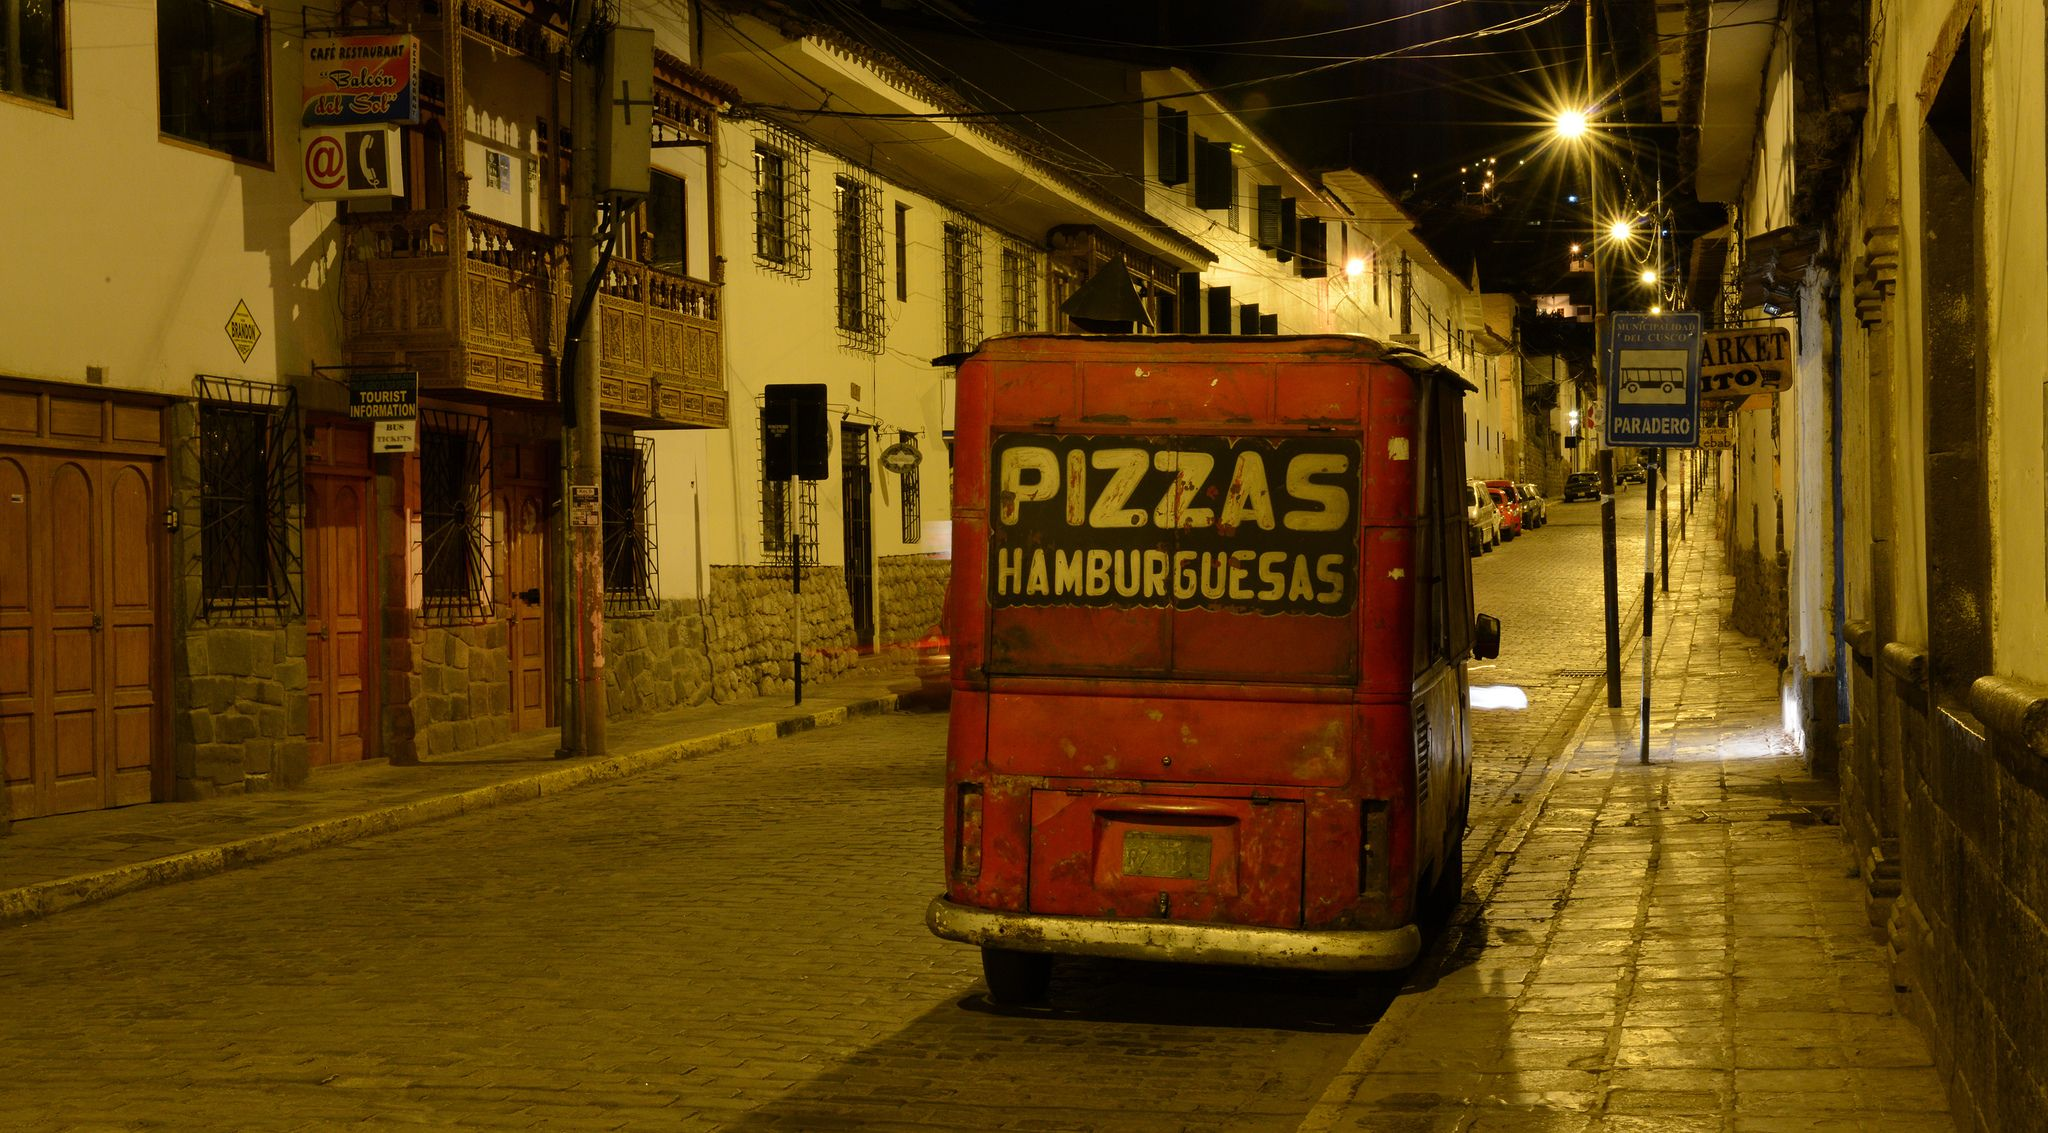 https://flic.kr/p/gSefB5   Cusco de noche. Pizzas y hamburguesas   Calle Choquechaca